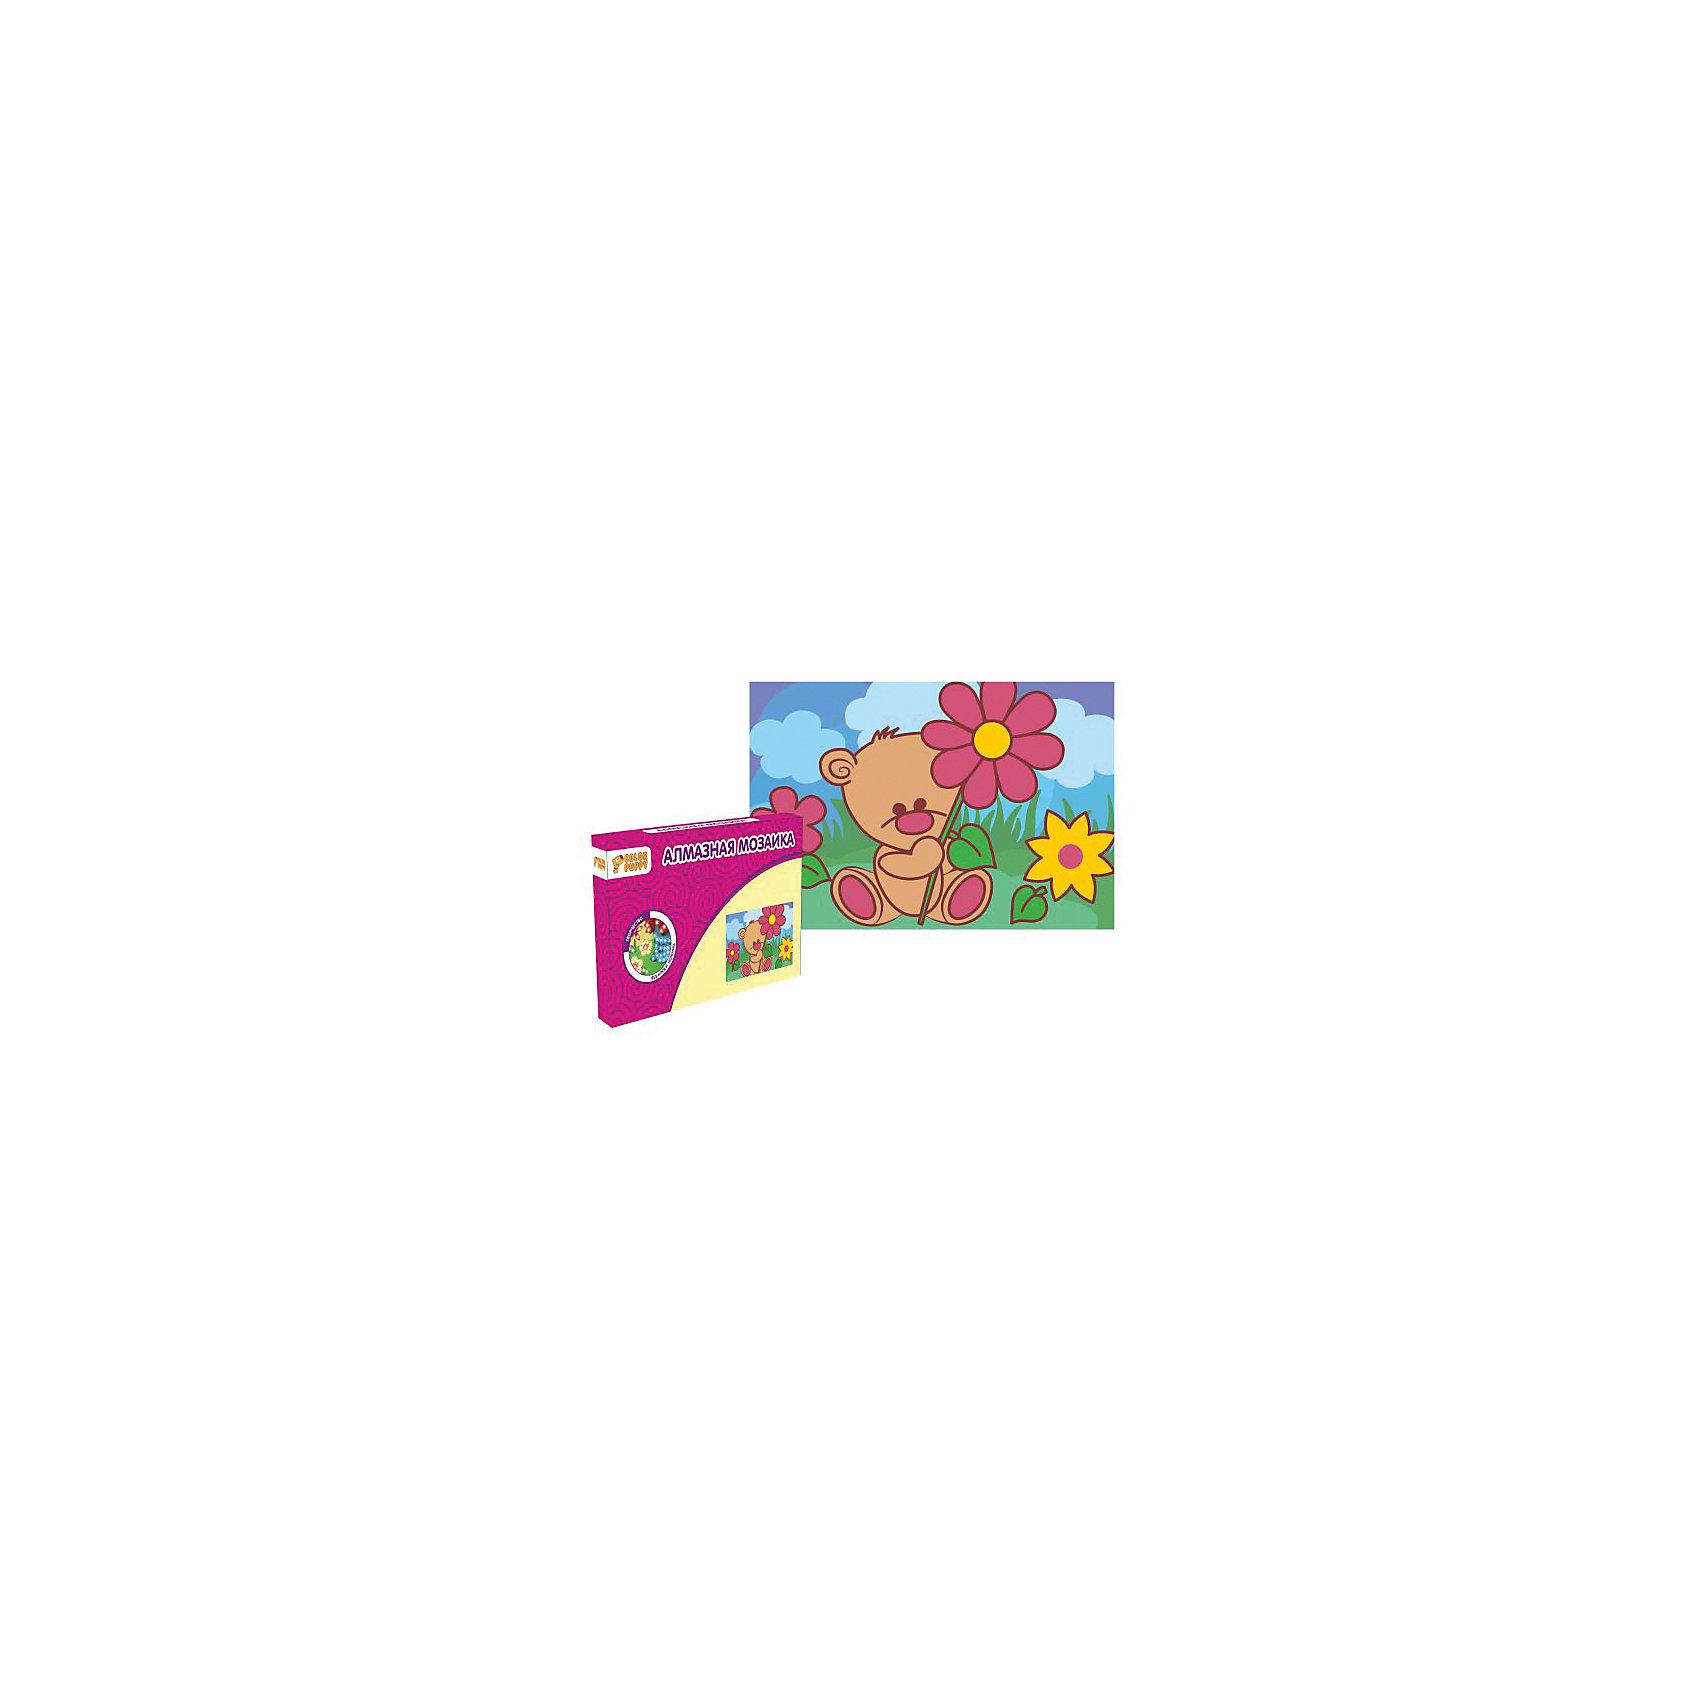 Color Puppy Набор для творчества Алмазная мозаика «Мишка» color puppy набор для творчества алмазная мозаика мишка